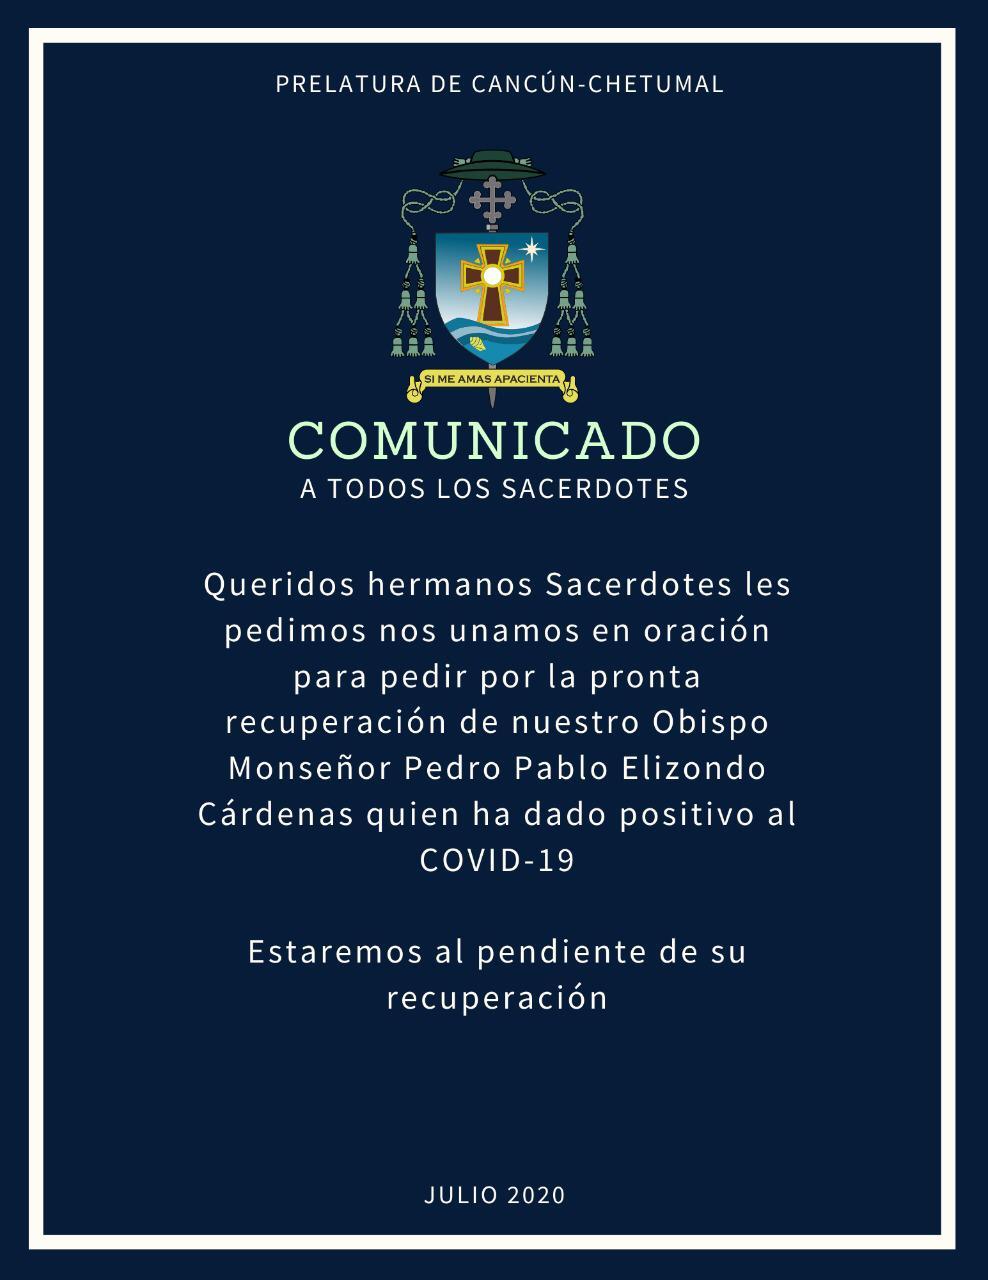 Cancún-Chetumal